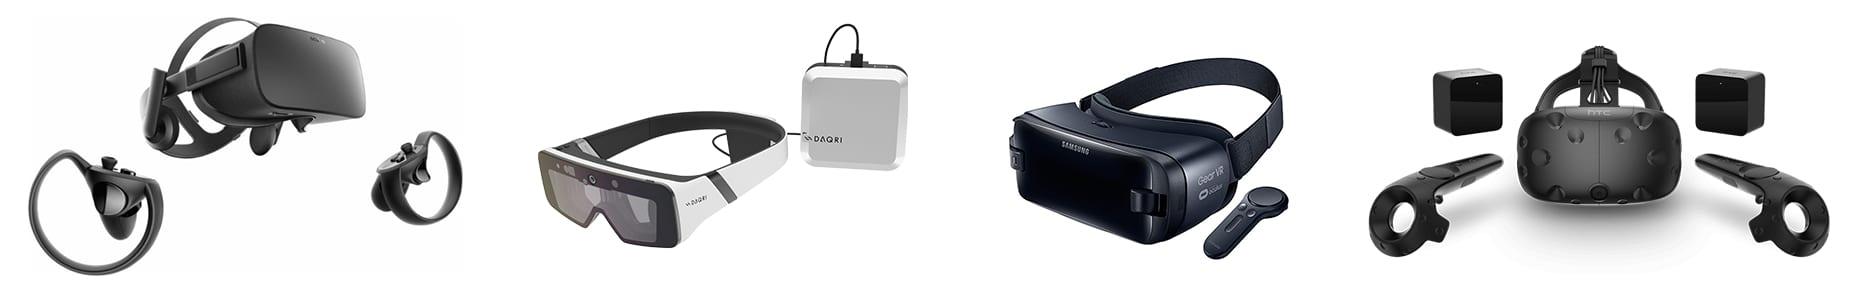 tworeality-realidad-virtual-aumentada-daqri-oculus-samsung-htc-vive